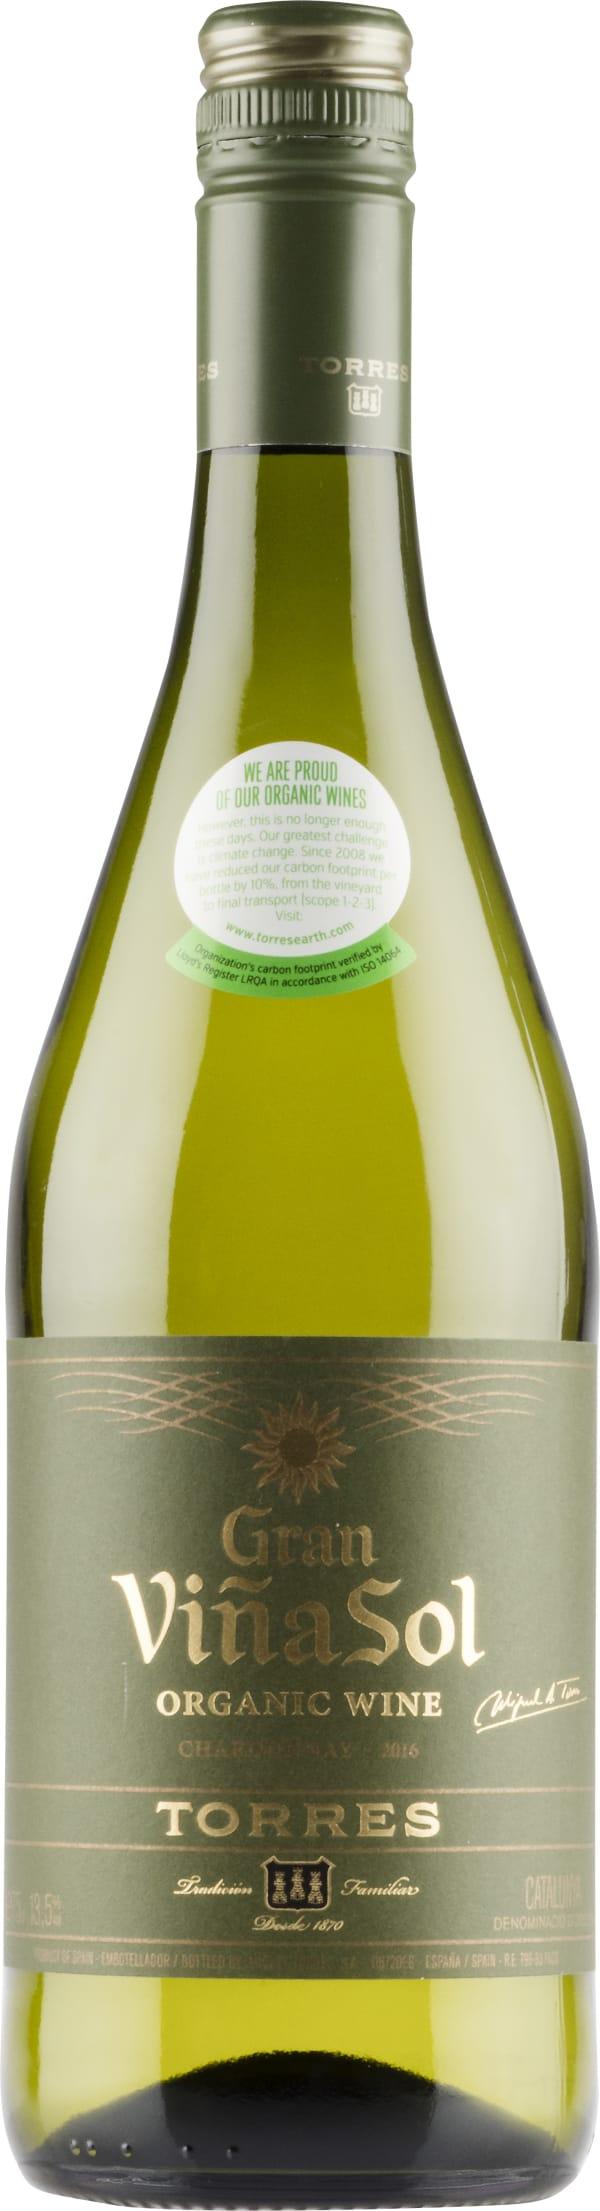 Torres Gran Viña Sol Chardonnay 2015